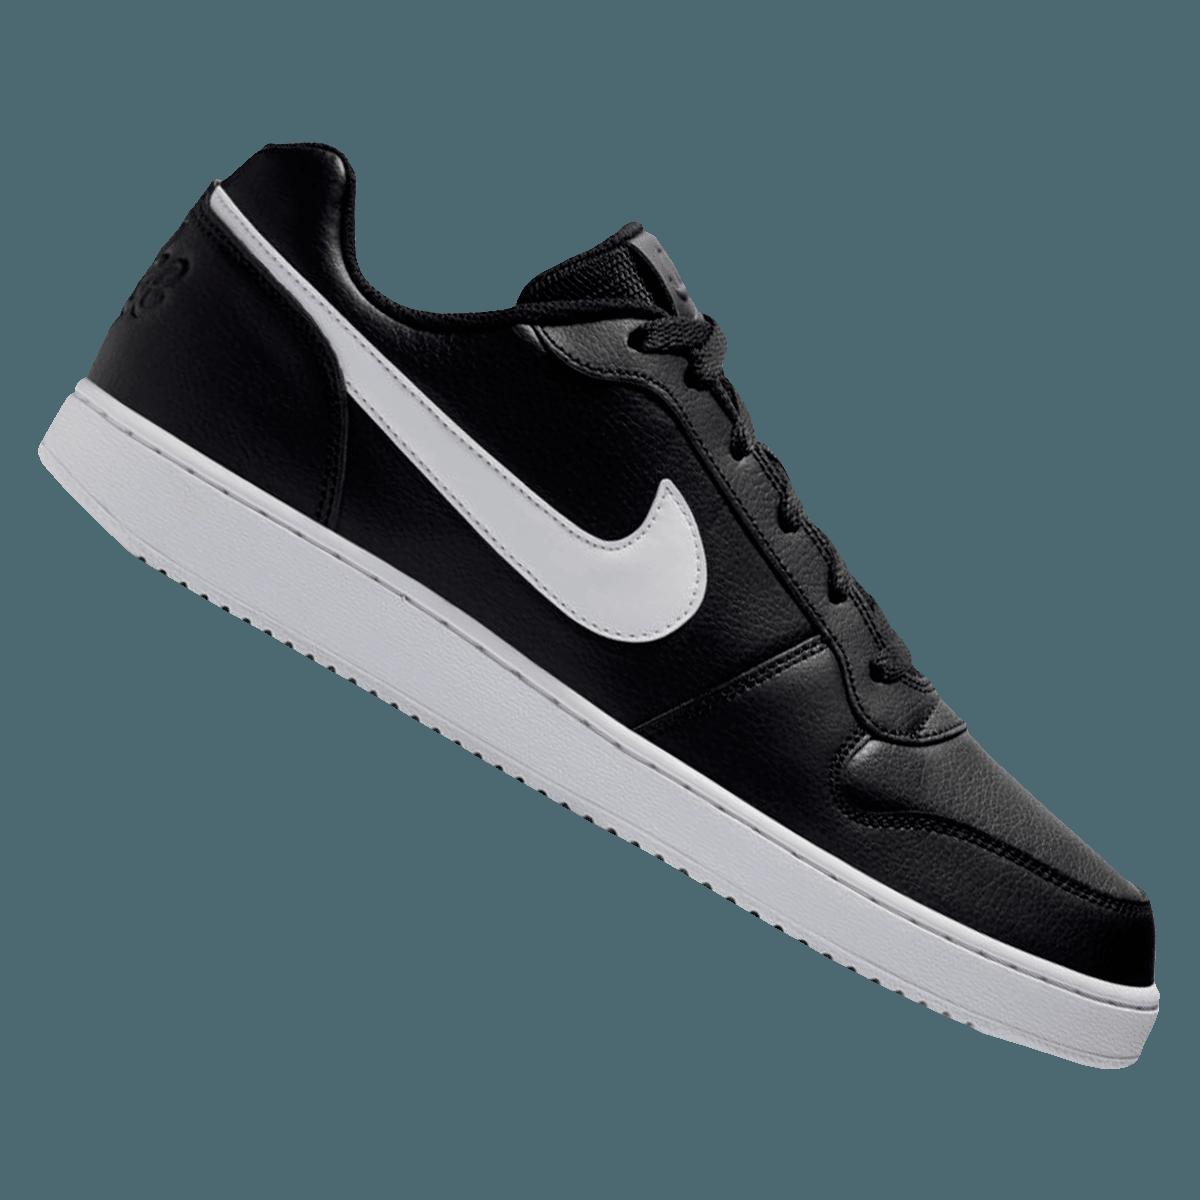 Herren Sneaker Ebernon Low Premium, weißschwarz, 44